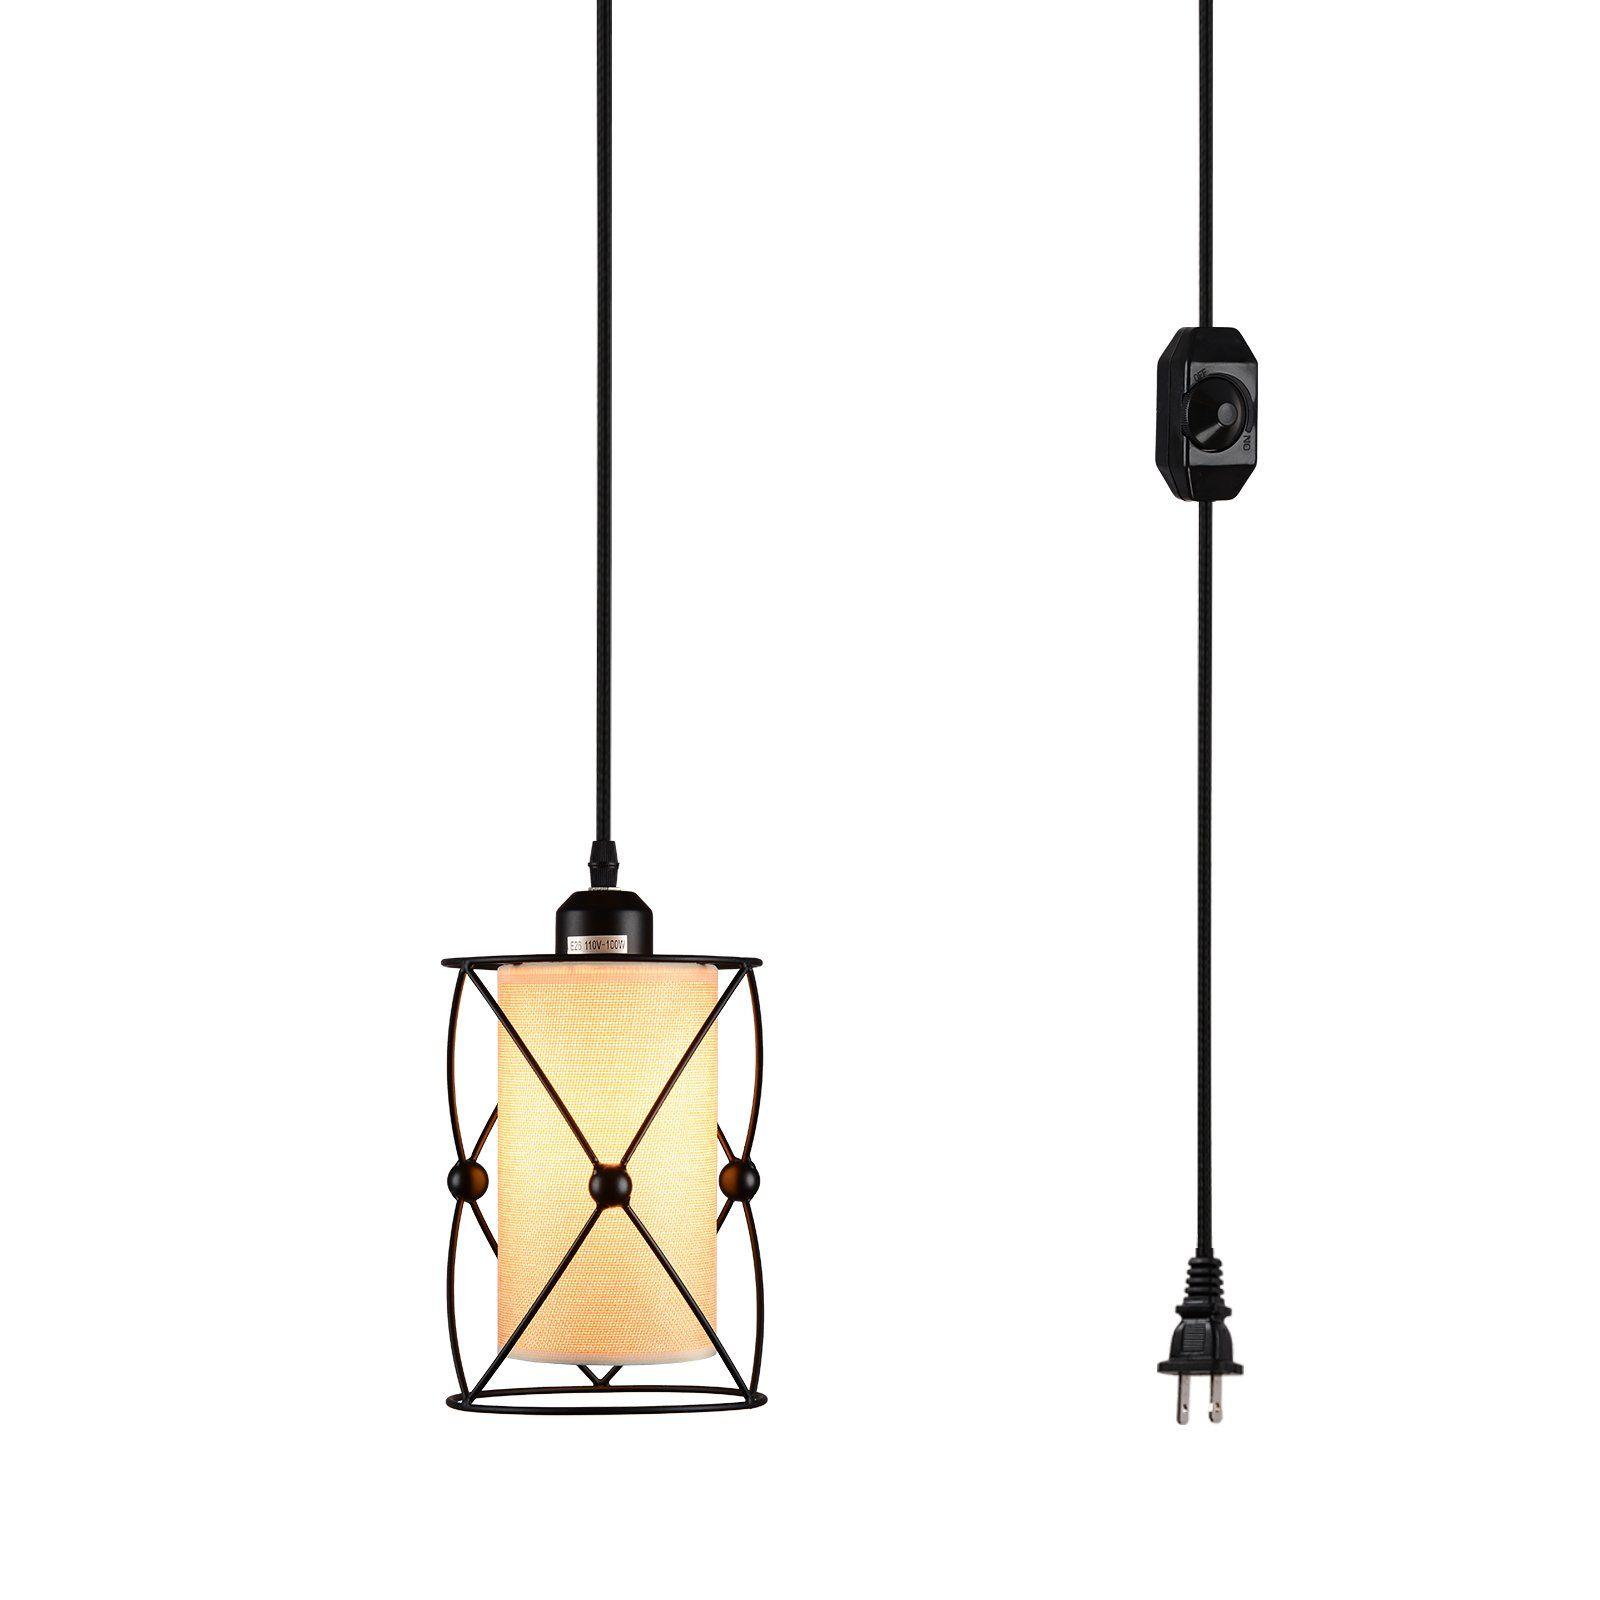 modern industrial pendant lighting. Creatgeek Plug-In Modern Industrial Pendant Light With Linen Drum Lamp Shabe, 15\u0027 Lighting